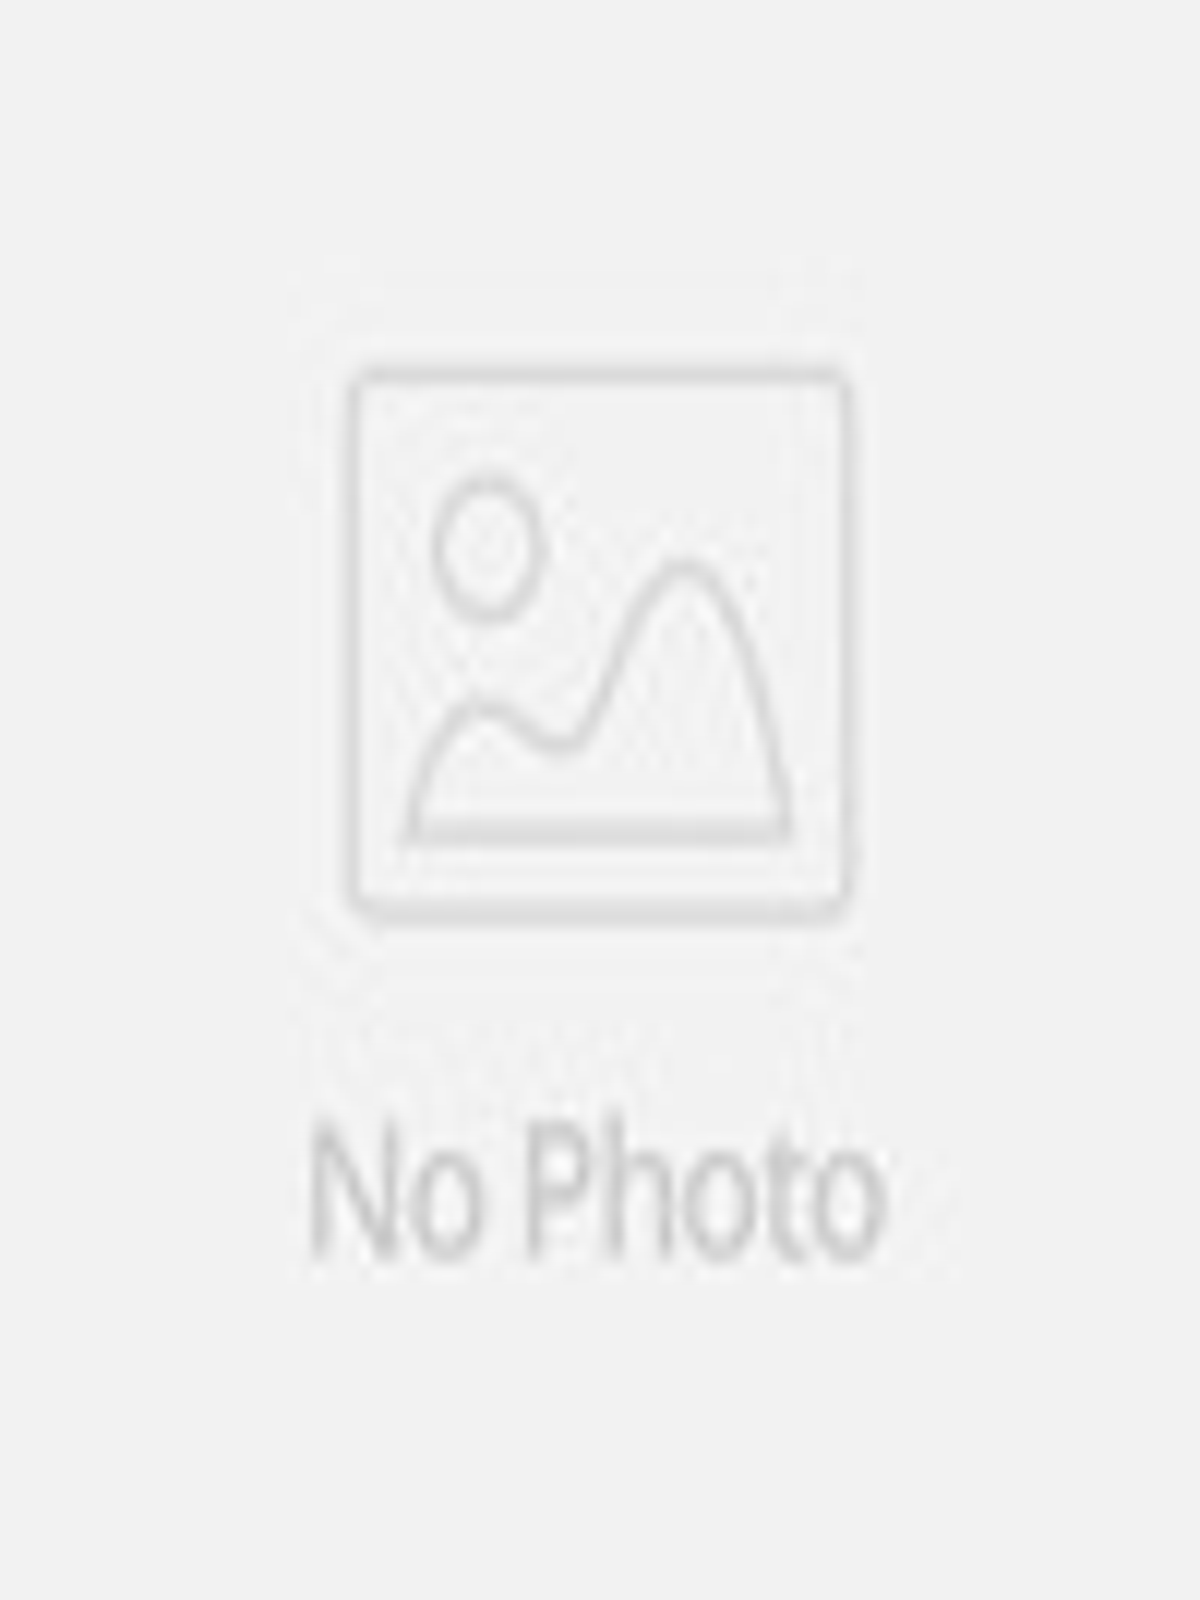 dhgates wedding dresses 65